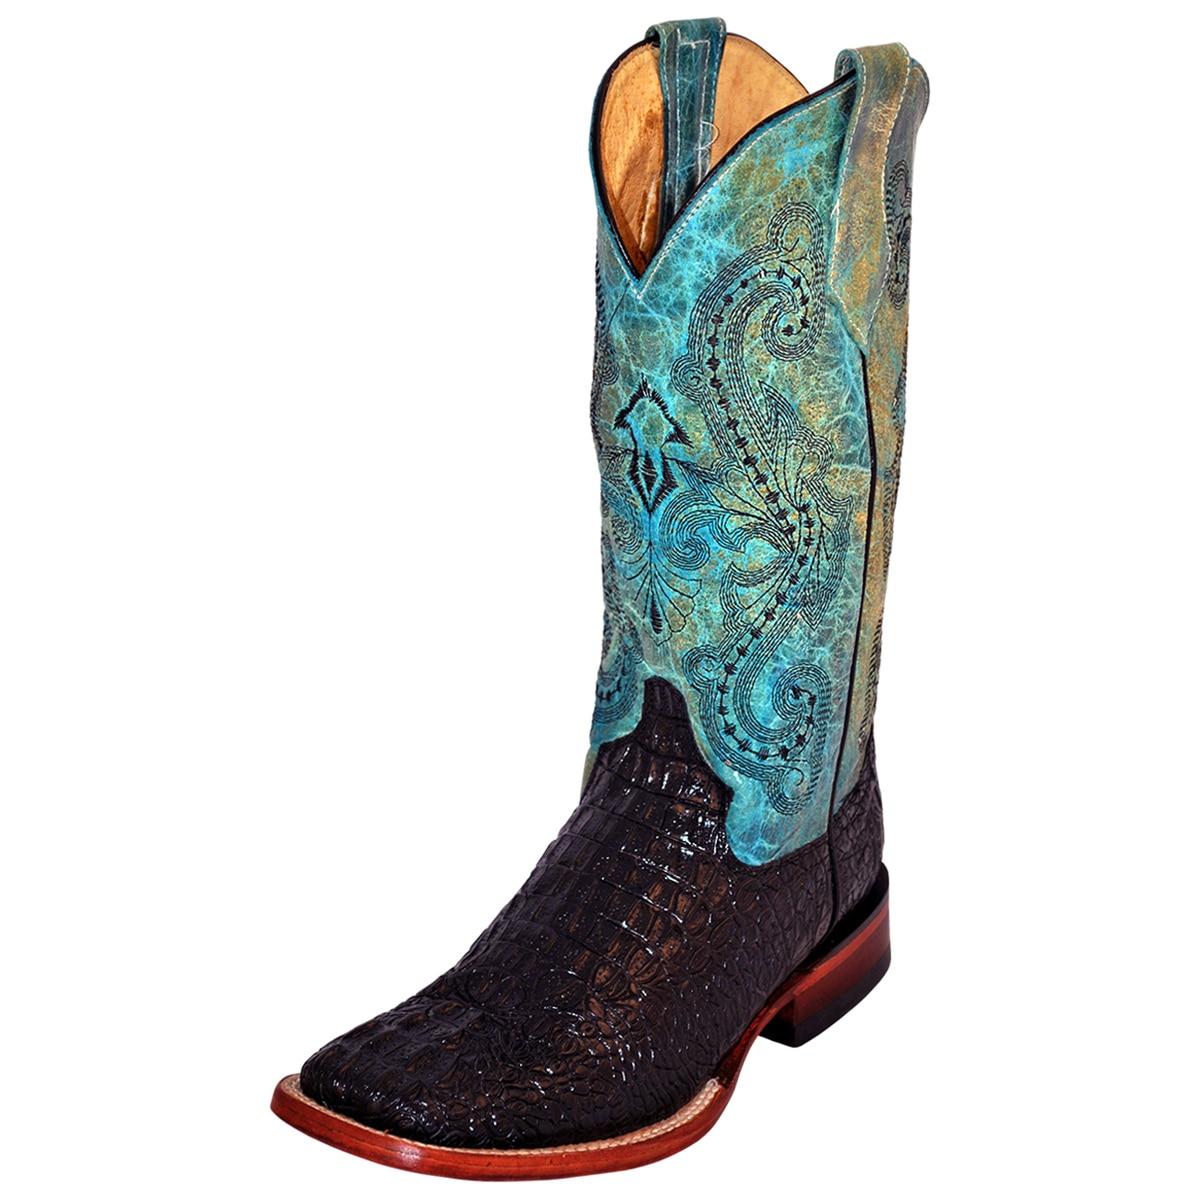 Ferrini Women's Print Caiman Wide Square Toe Boots